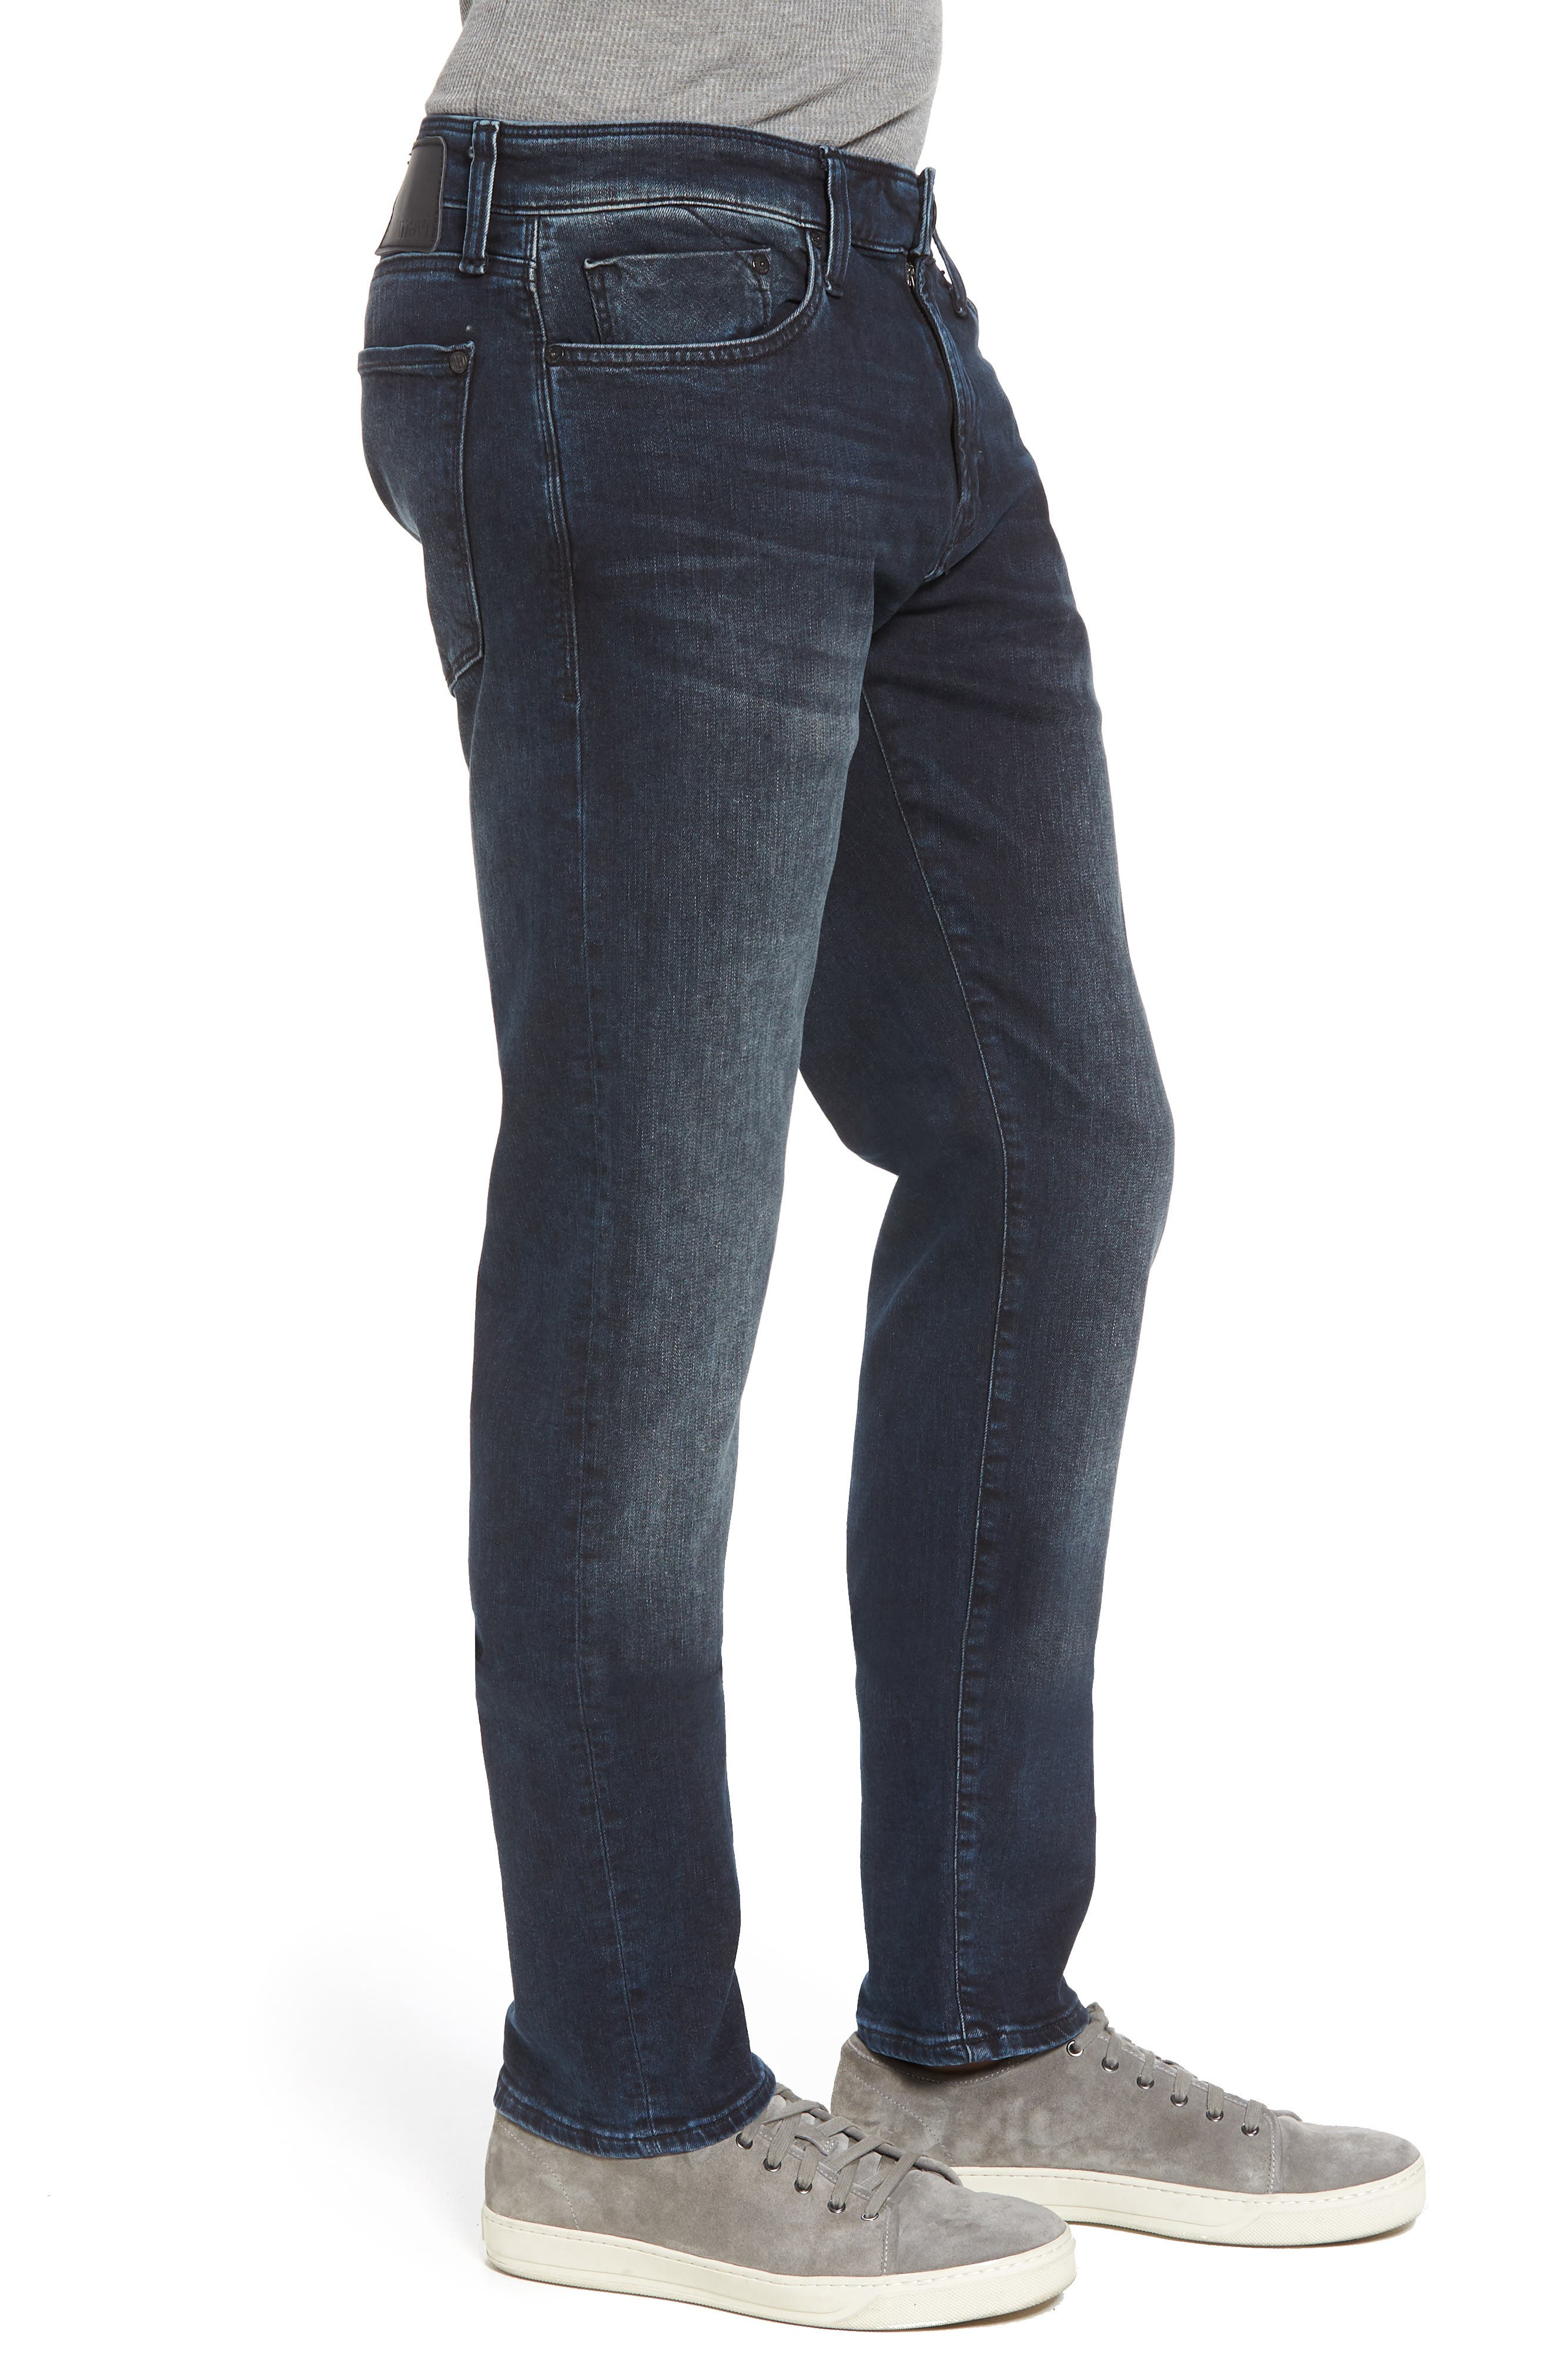 Jake Slim Fit Jeans,                             Alternate thumbnail 3, color,                             401